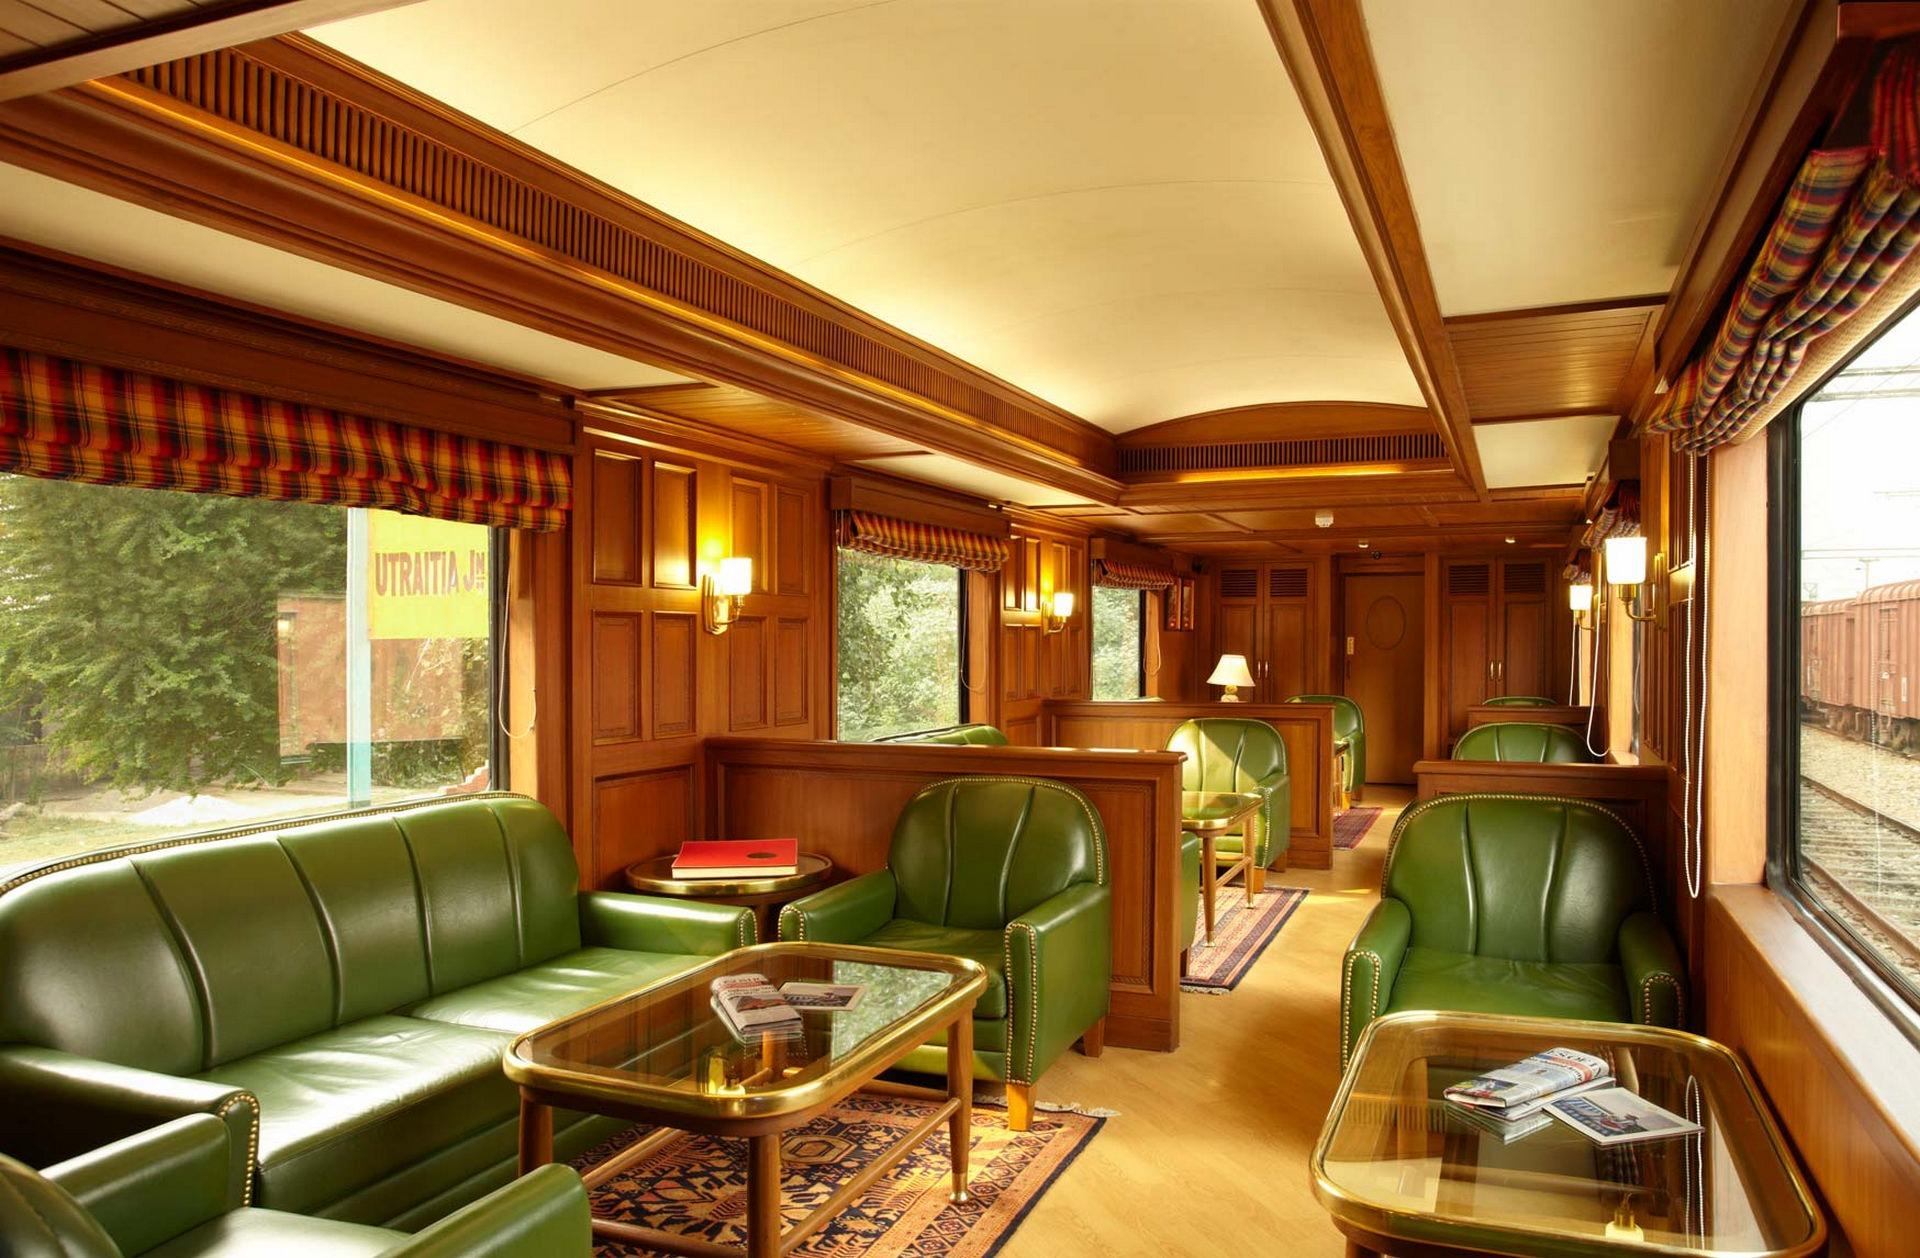 NOMAD-luksusowe-pociągi-Golden-Chariot-Indie-04